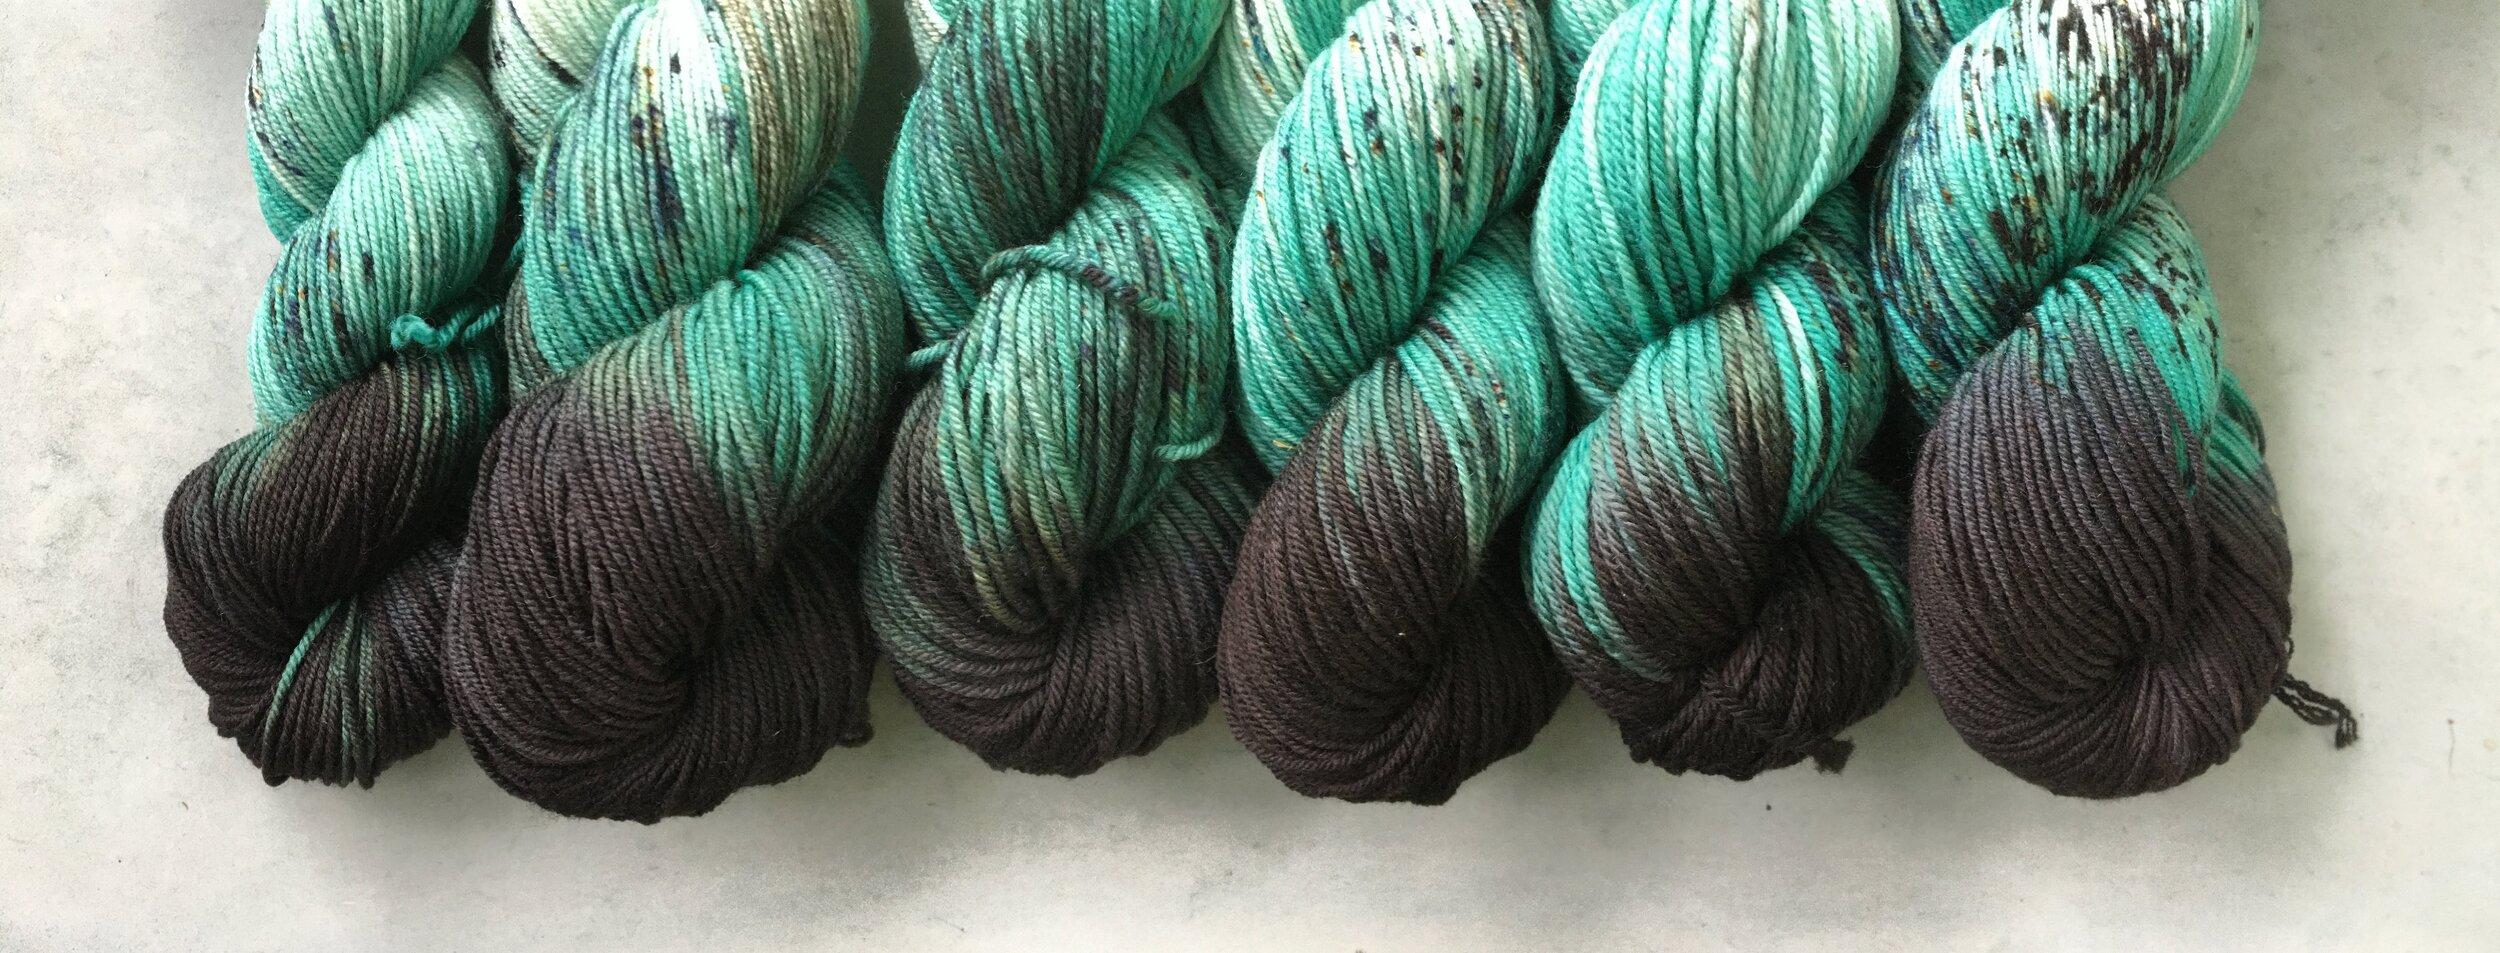 all yarn butts.JPG